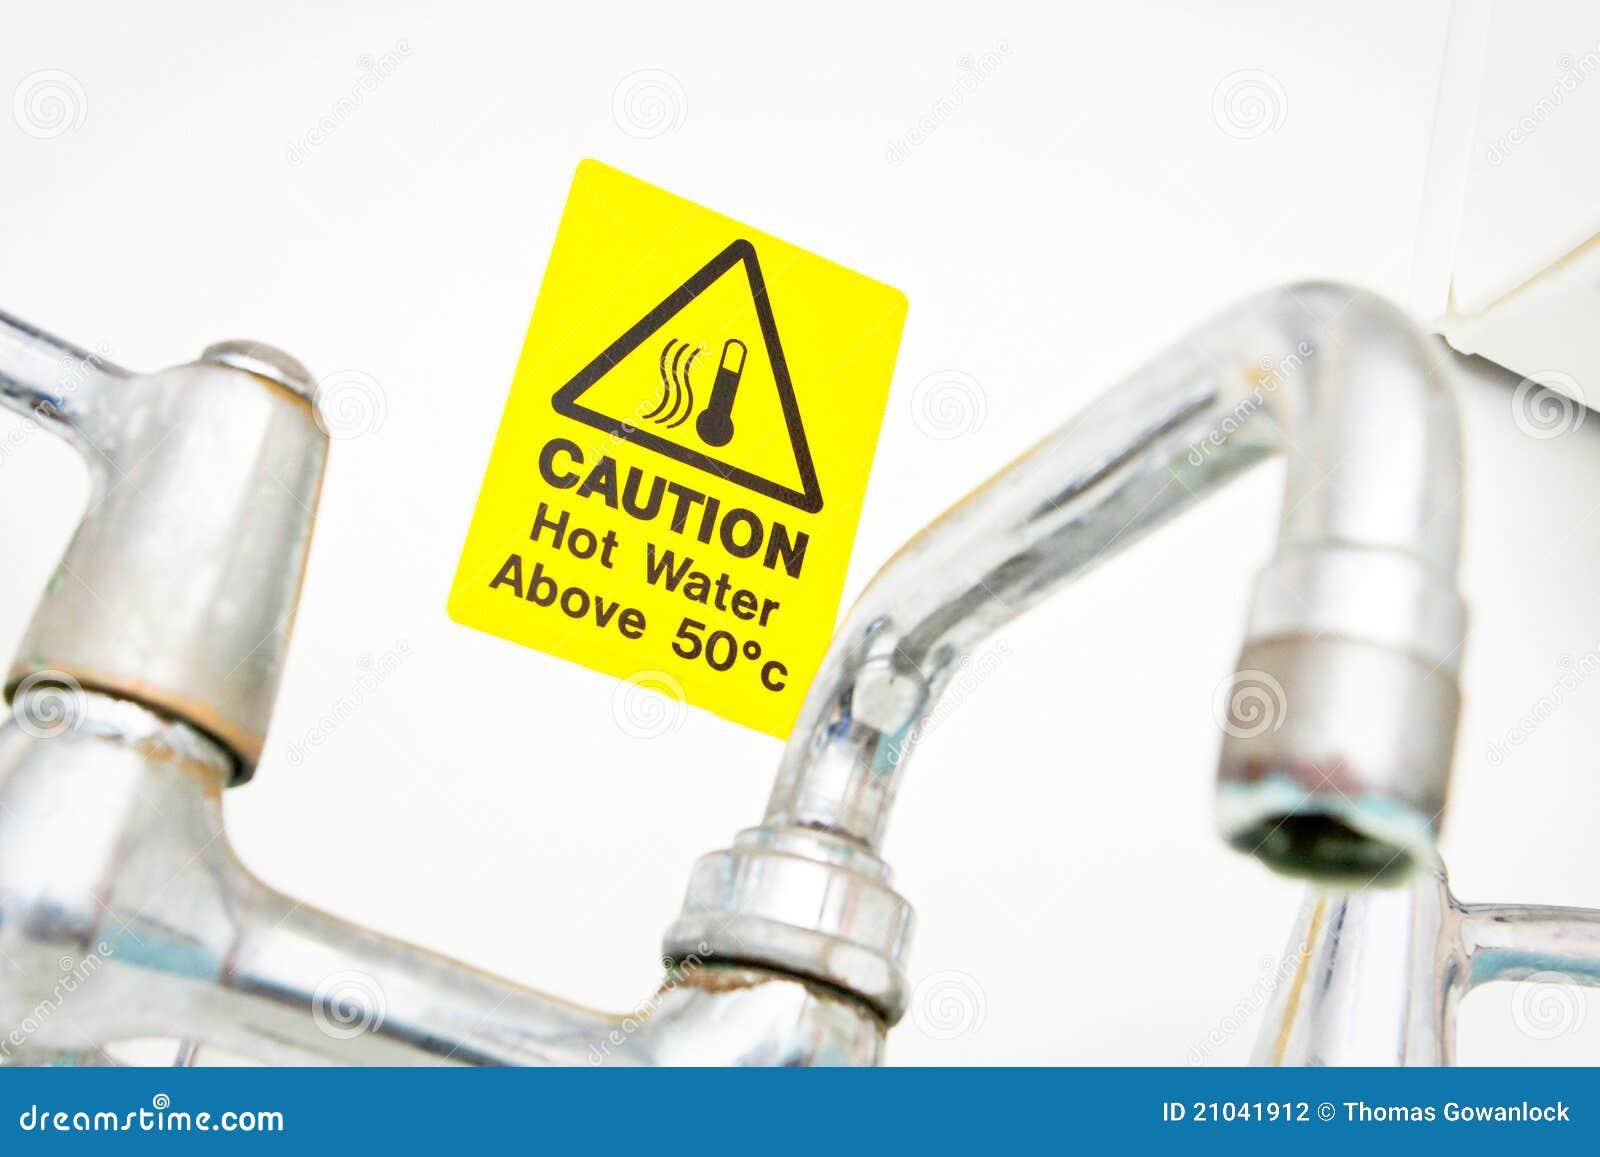 Warning Instant Hot Water : Hot water warning stock photography image